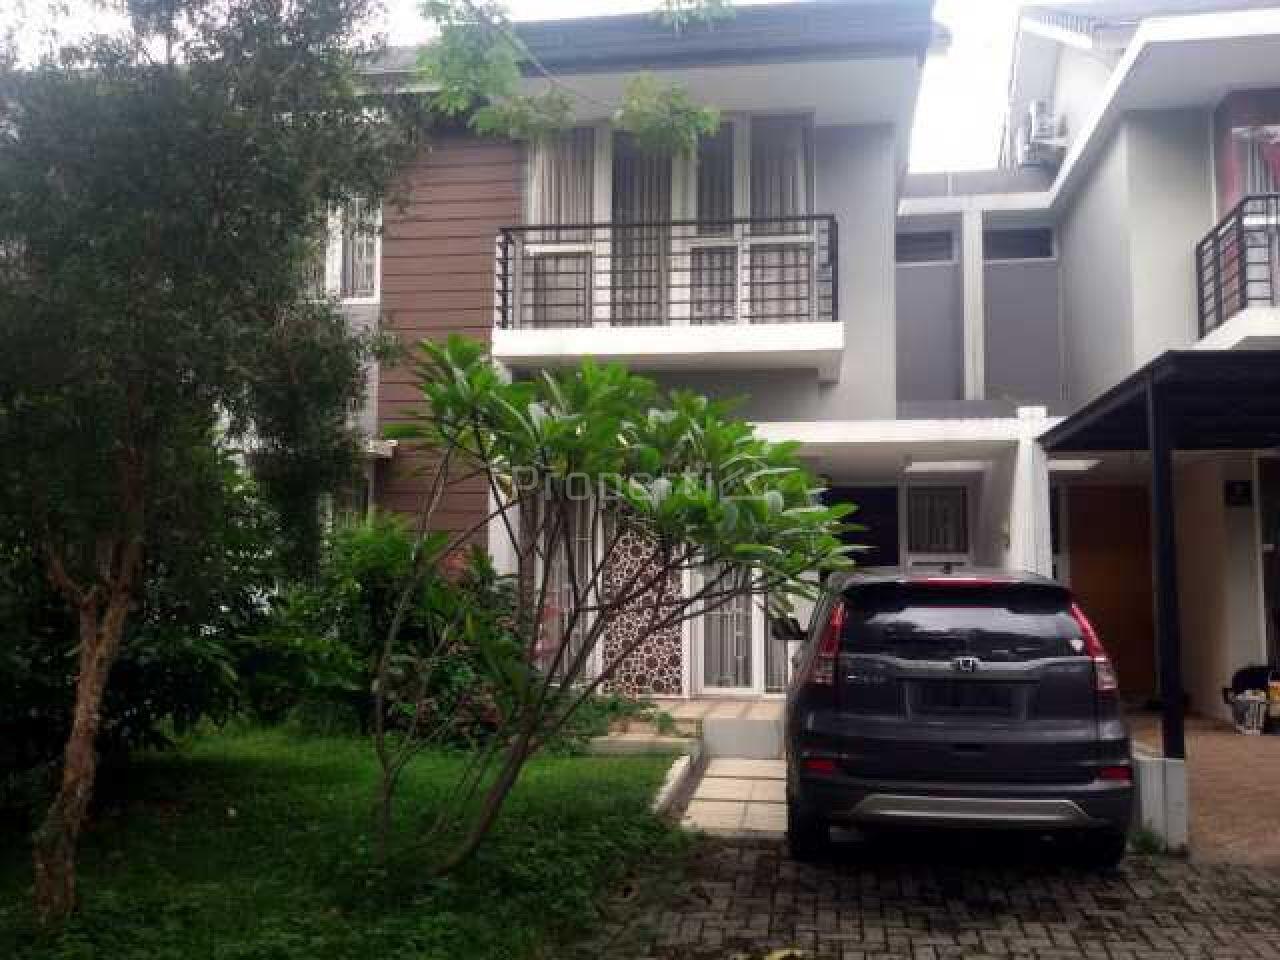 2.5-Storey House in Prestigious Residences in Cibubur, Jawa Barat